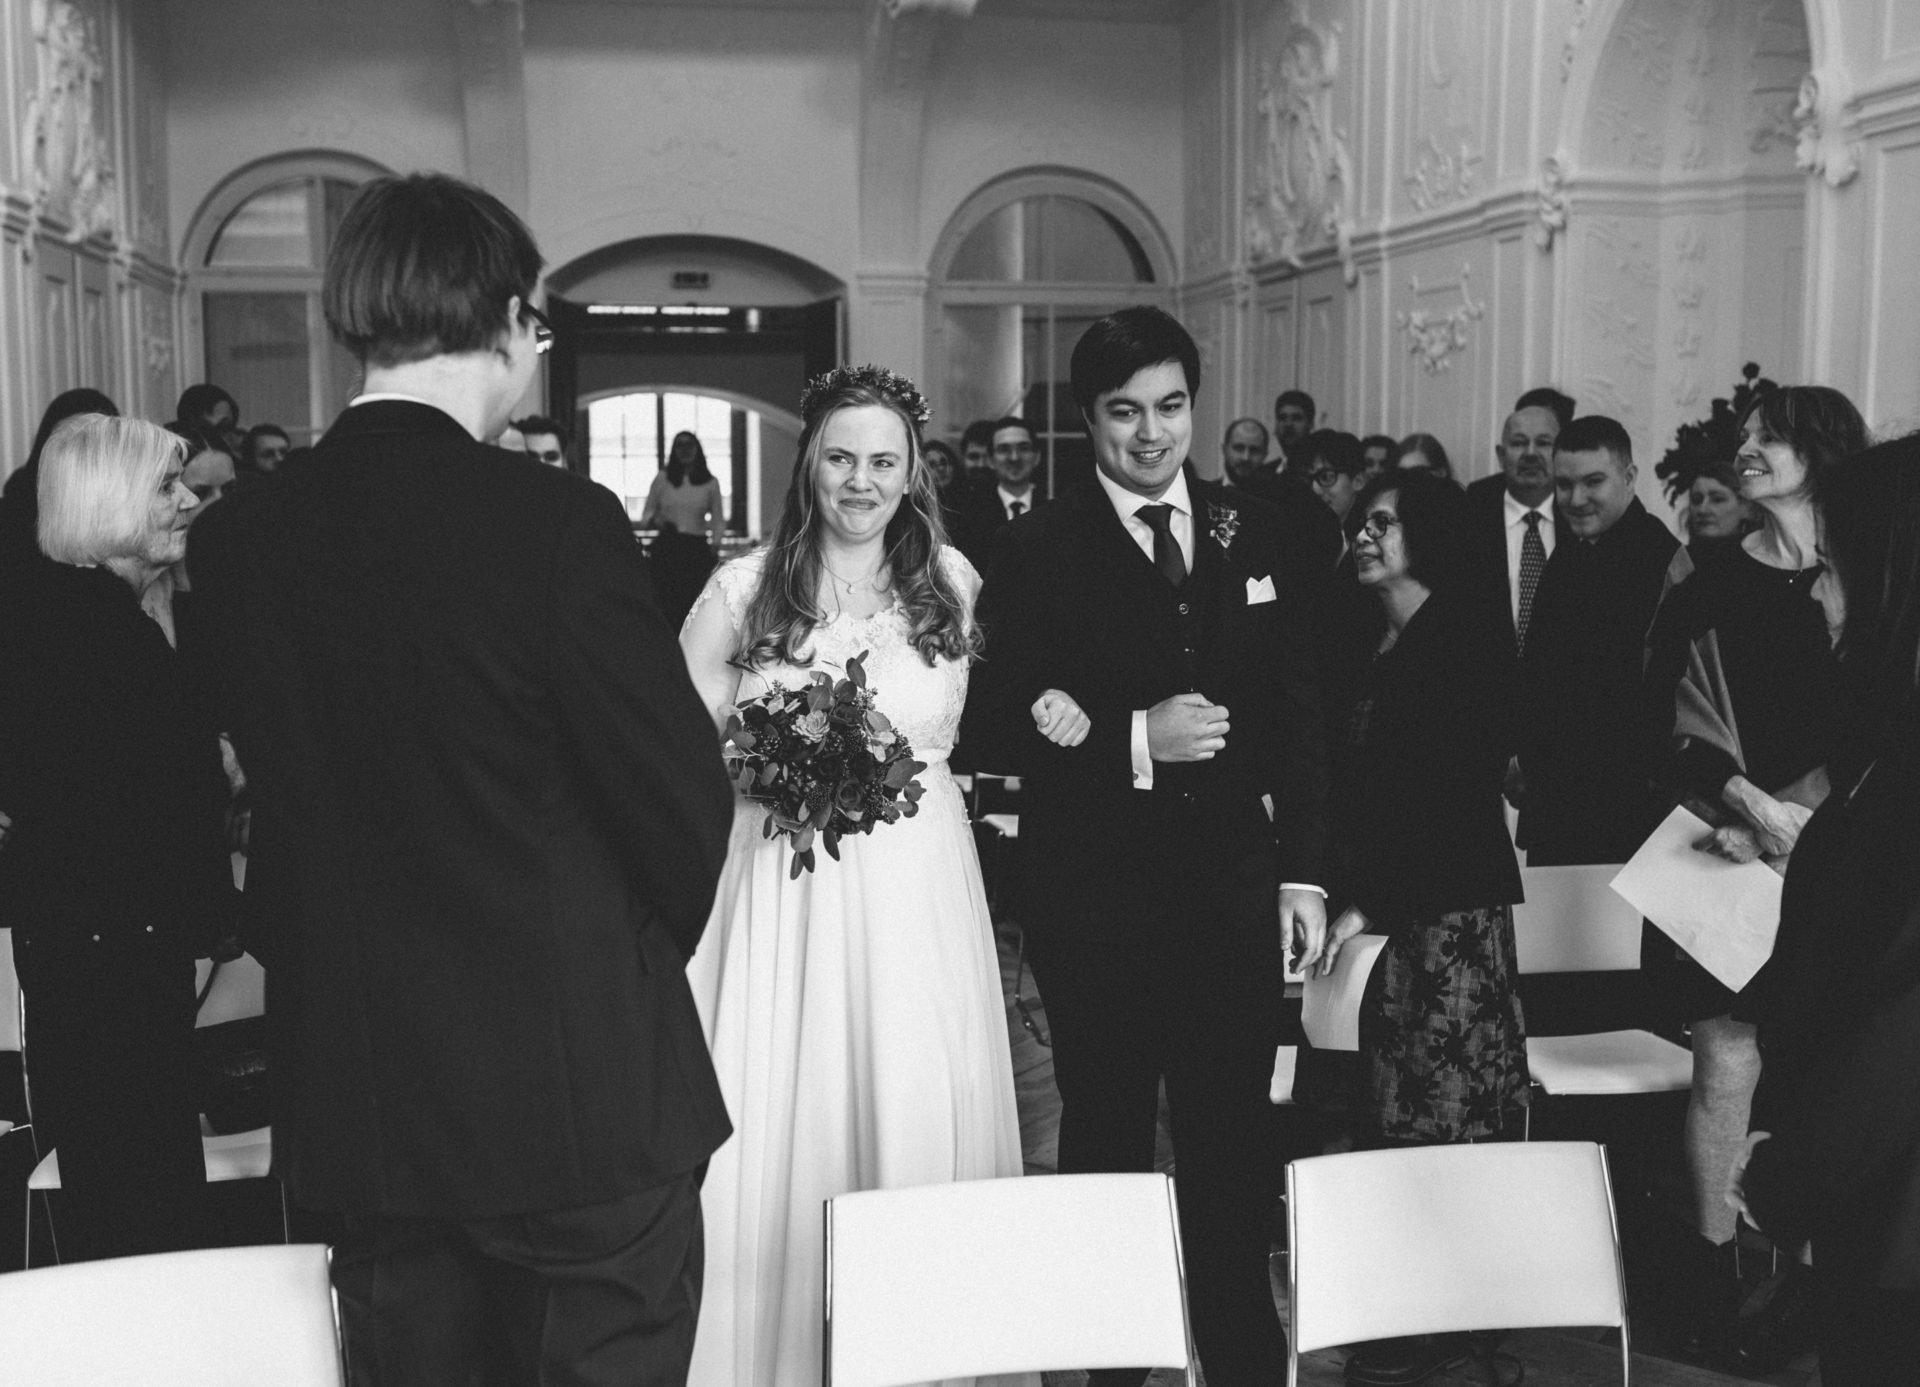 50mmfreunde Erfurt Jena Weimar Ettersburg Hochzeit 14 1920x1387 - Dezemberhochzeit im Schloss Ettersburg bei Weimar